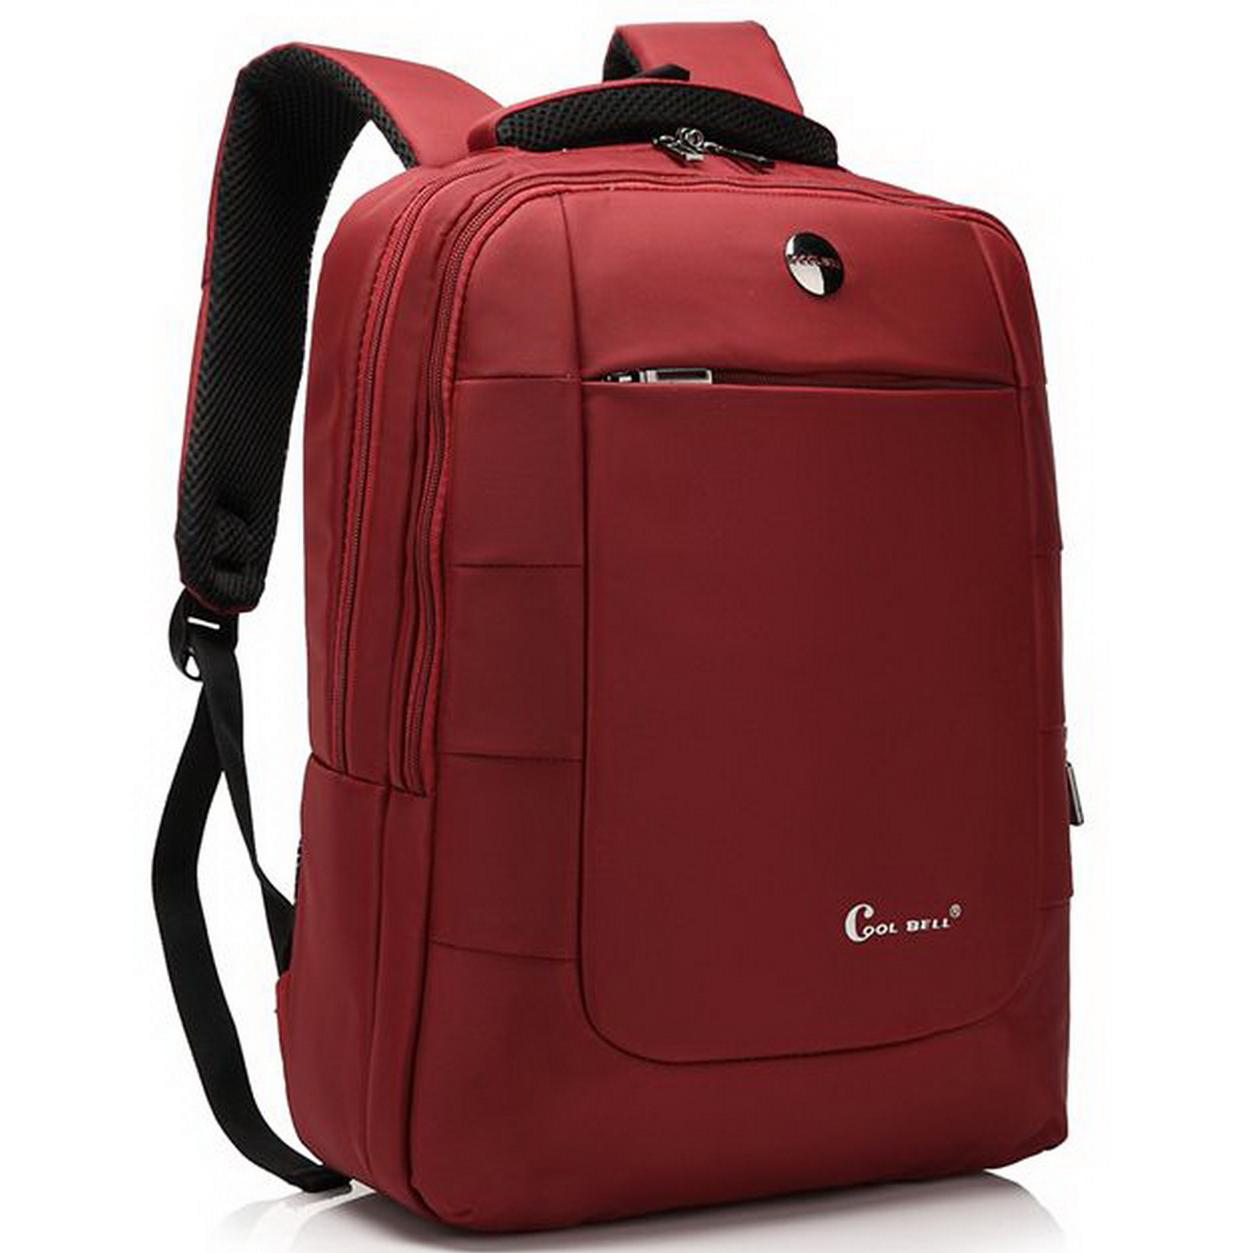 Details about Men Women Waterproof Laptop Backpack Travel School Bag  Rucksack For 15